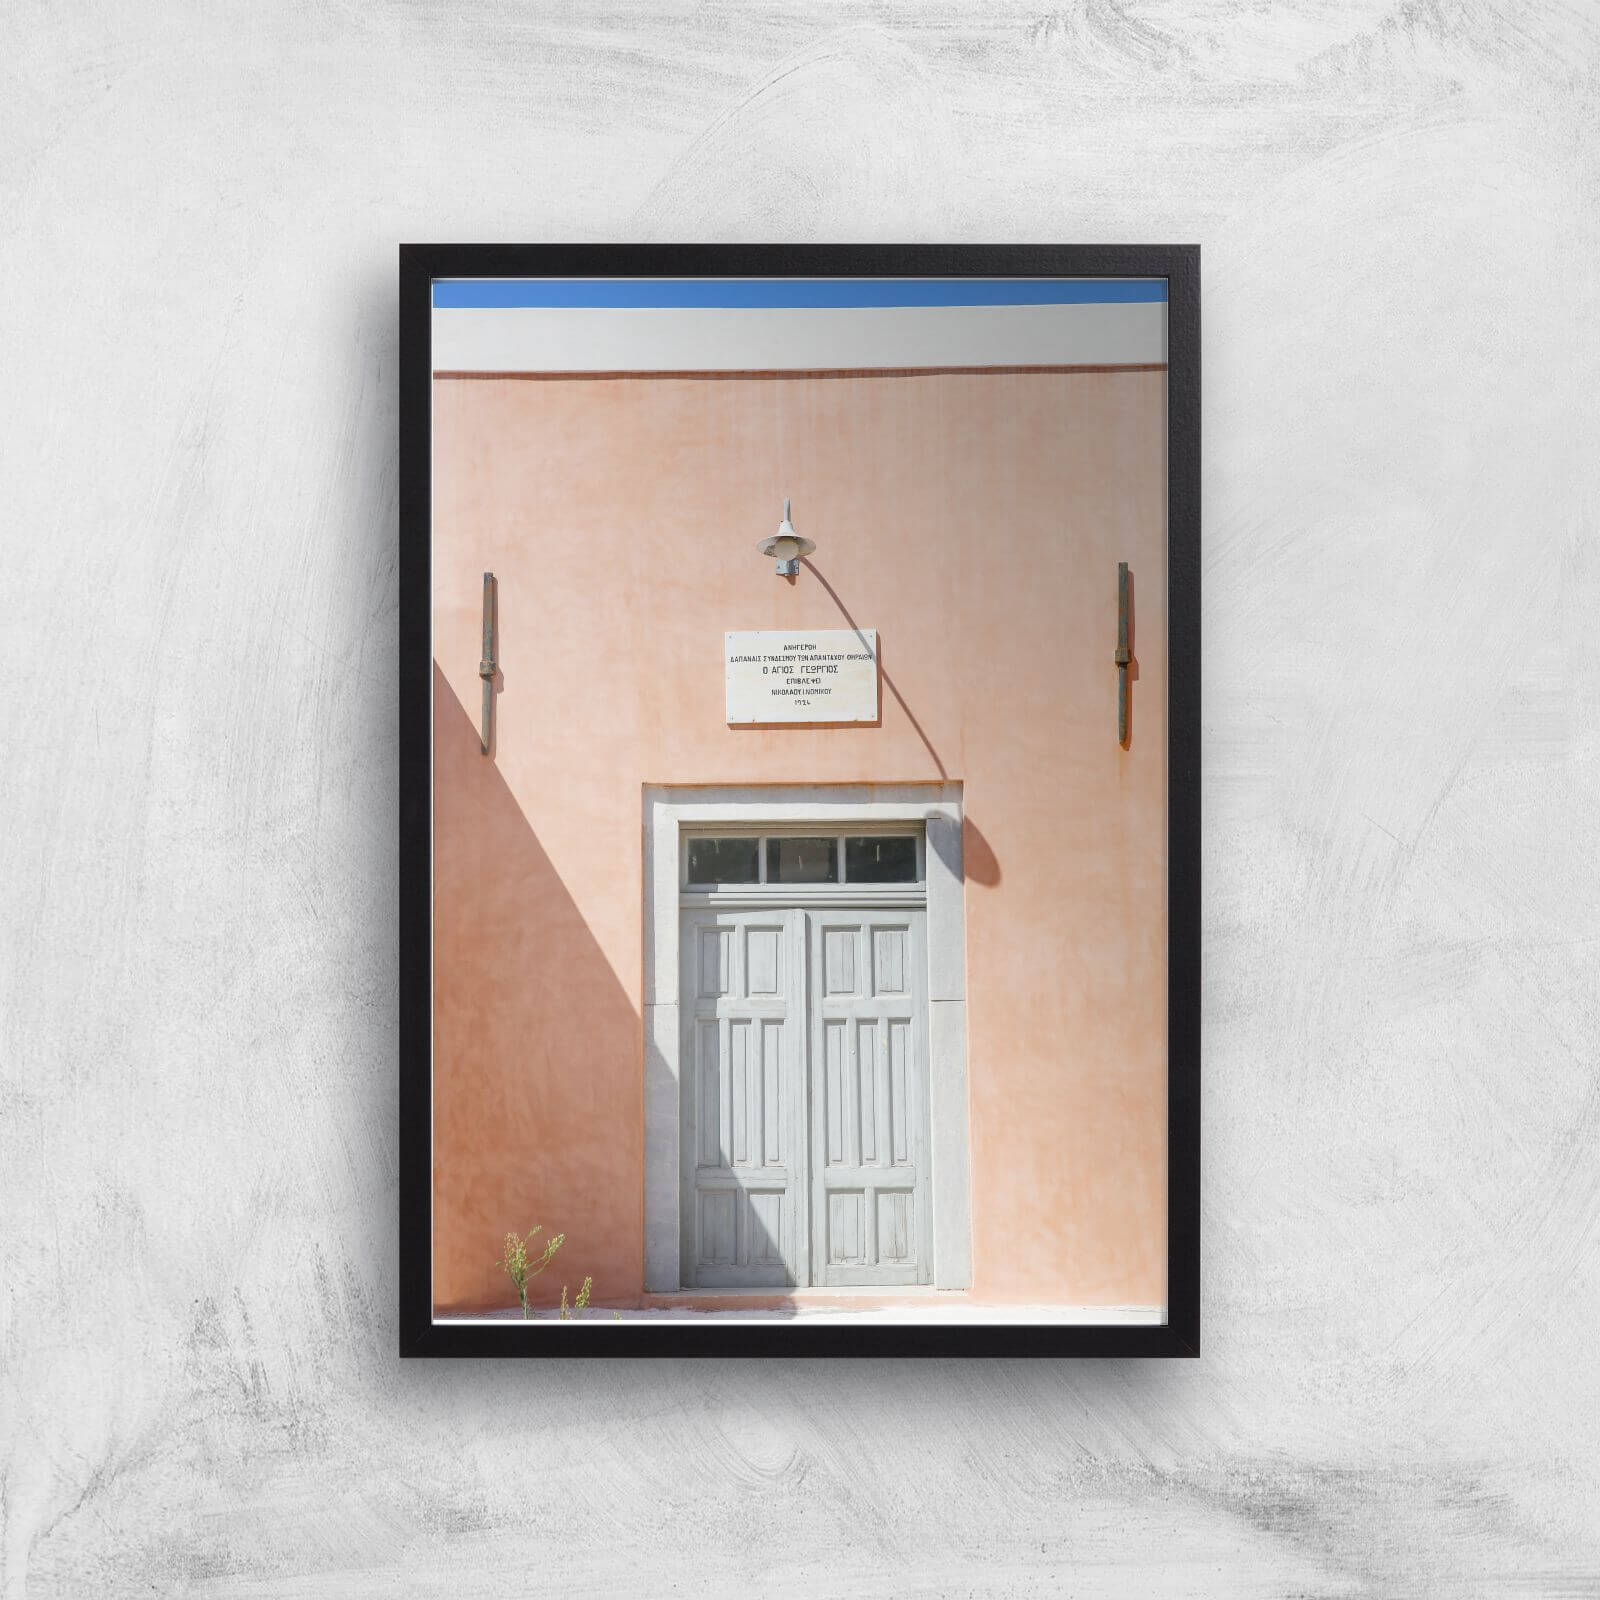 santorini secrets giclee art print - a2 - black frame